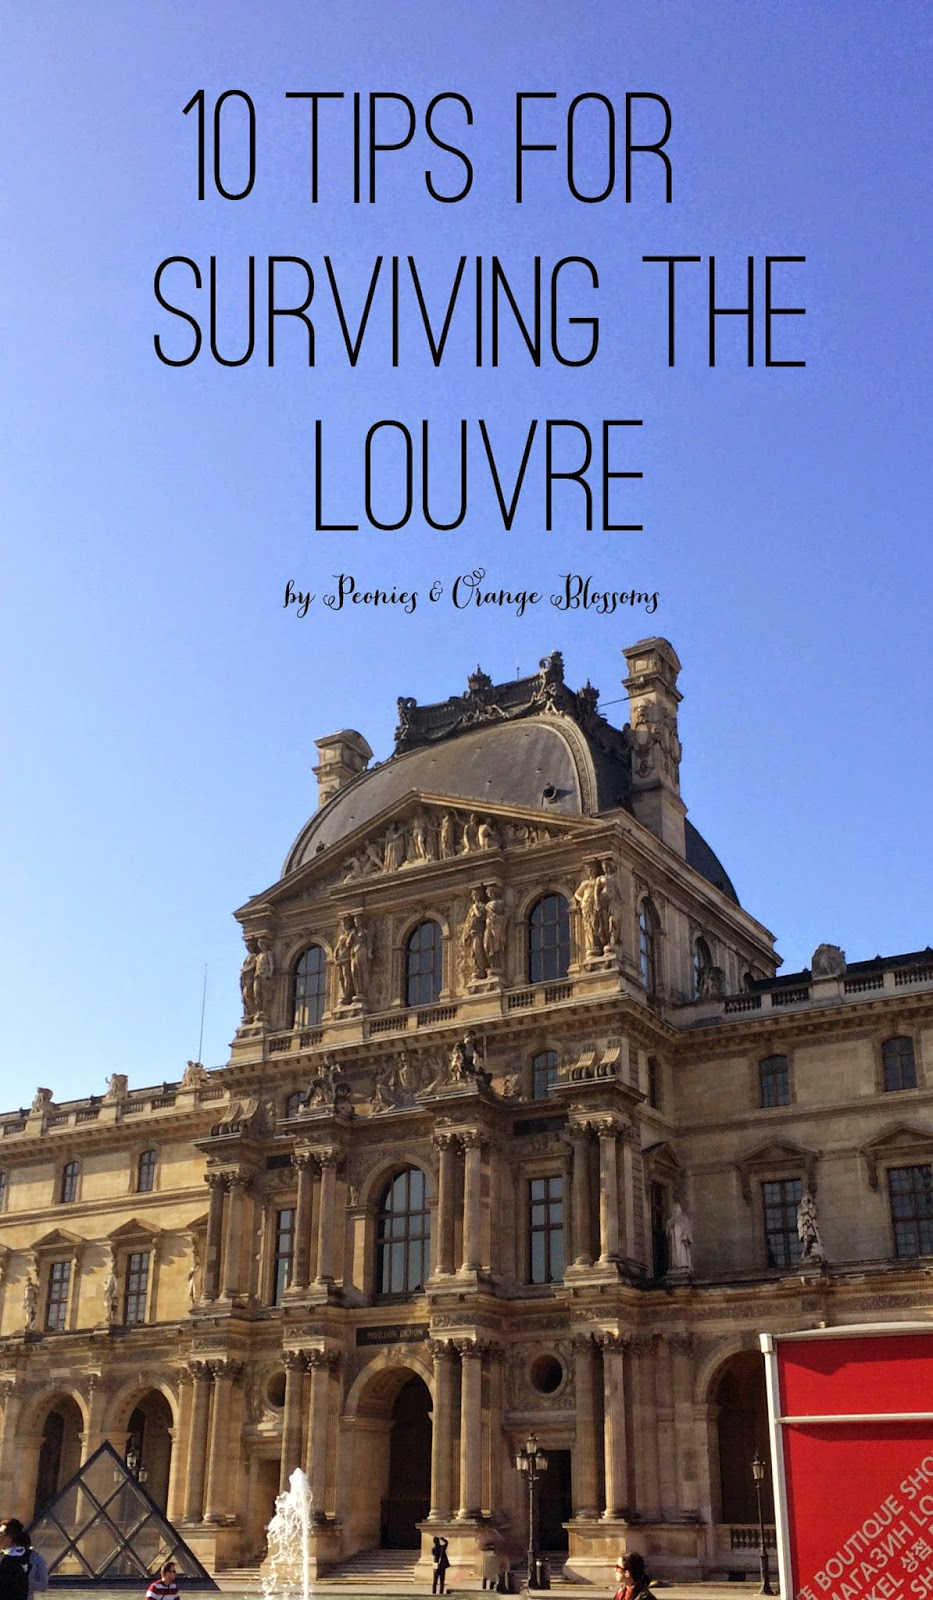 10 Tips for Surviving the Louvre - Trip to Paris